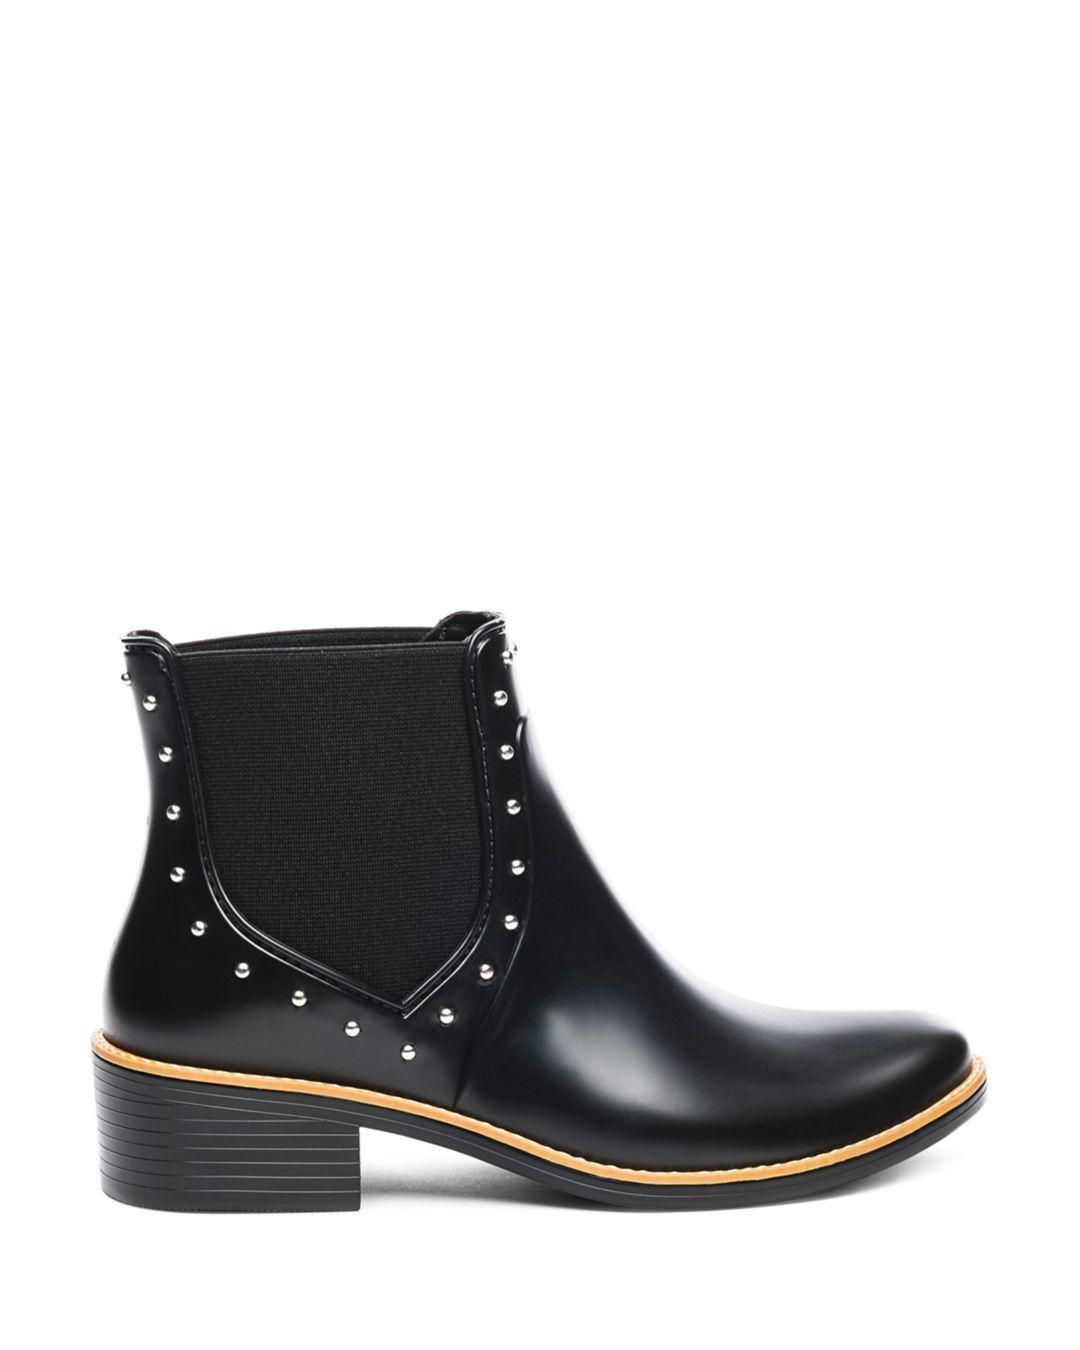 67652f928bb7b6 Lyst - Bernardo Peyton Studded Rubber Rain Ankle Boots in Black